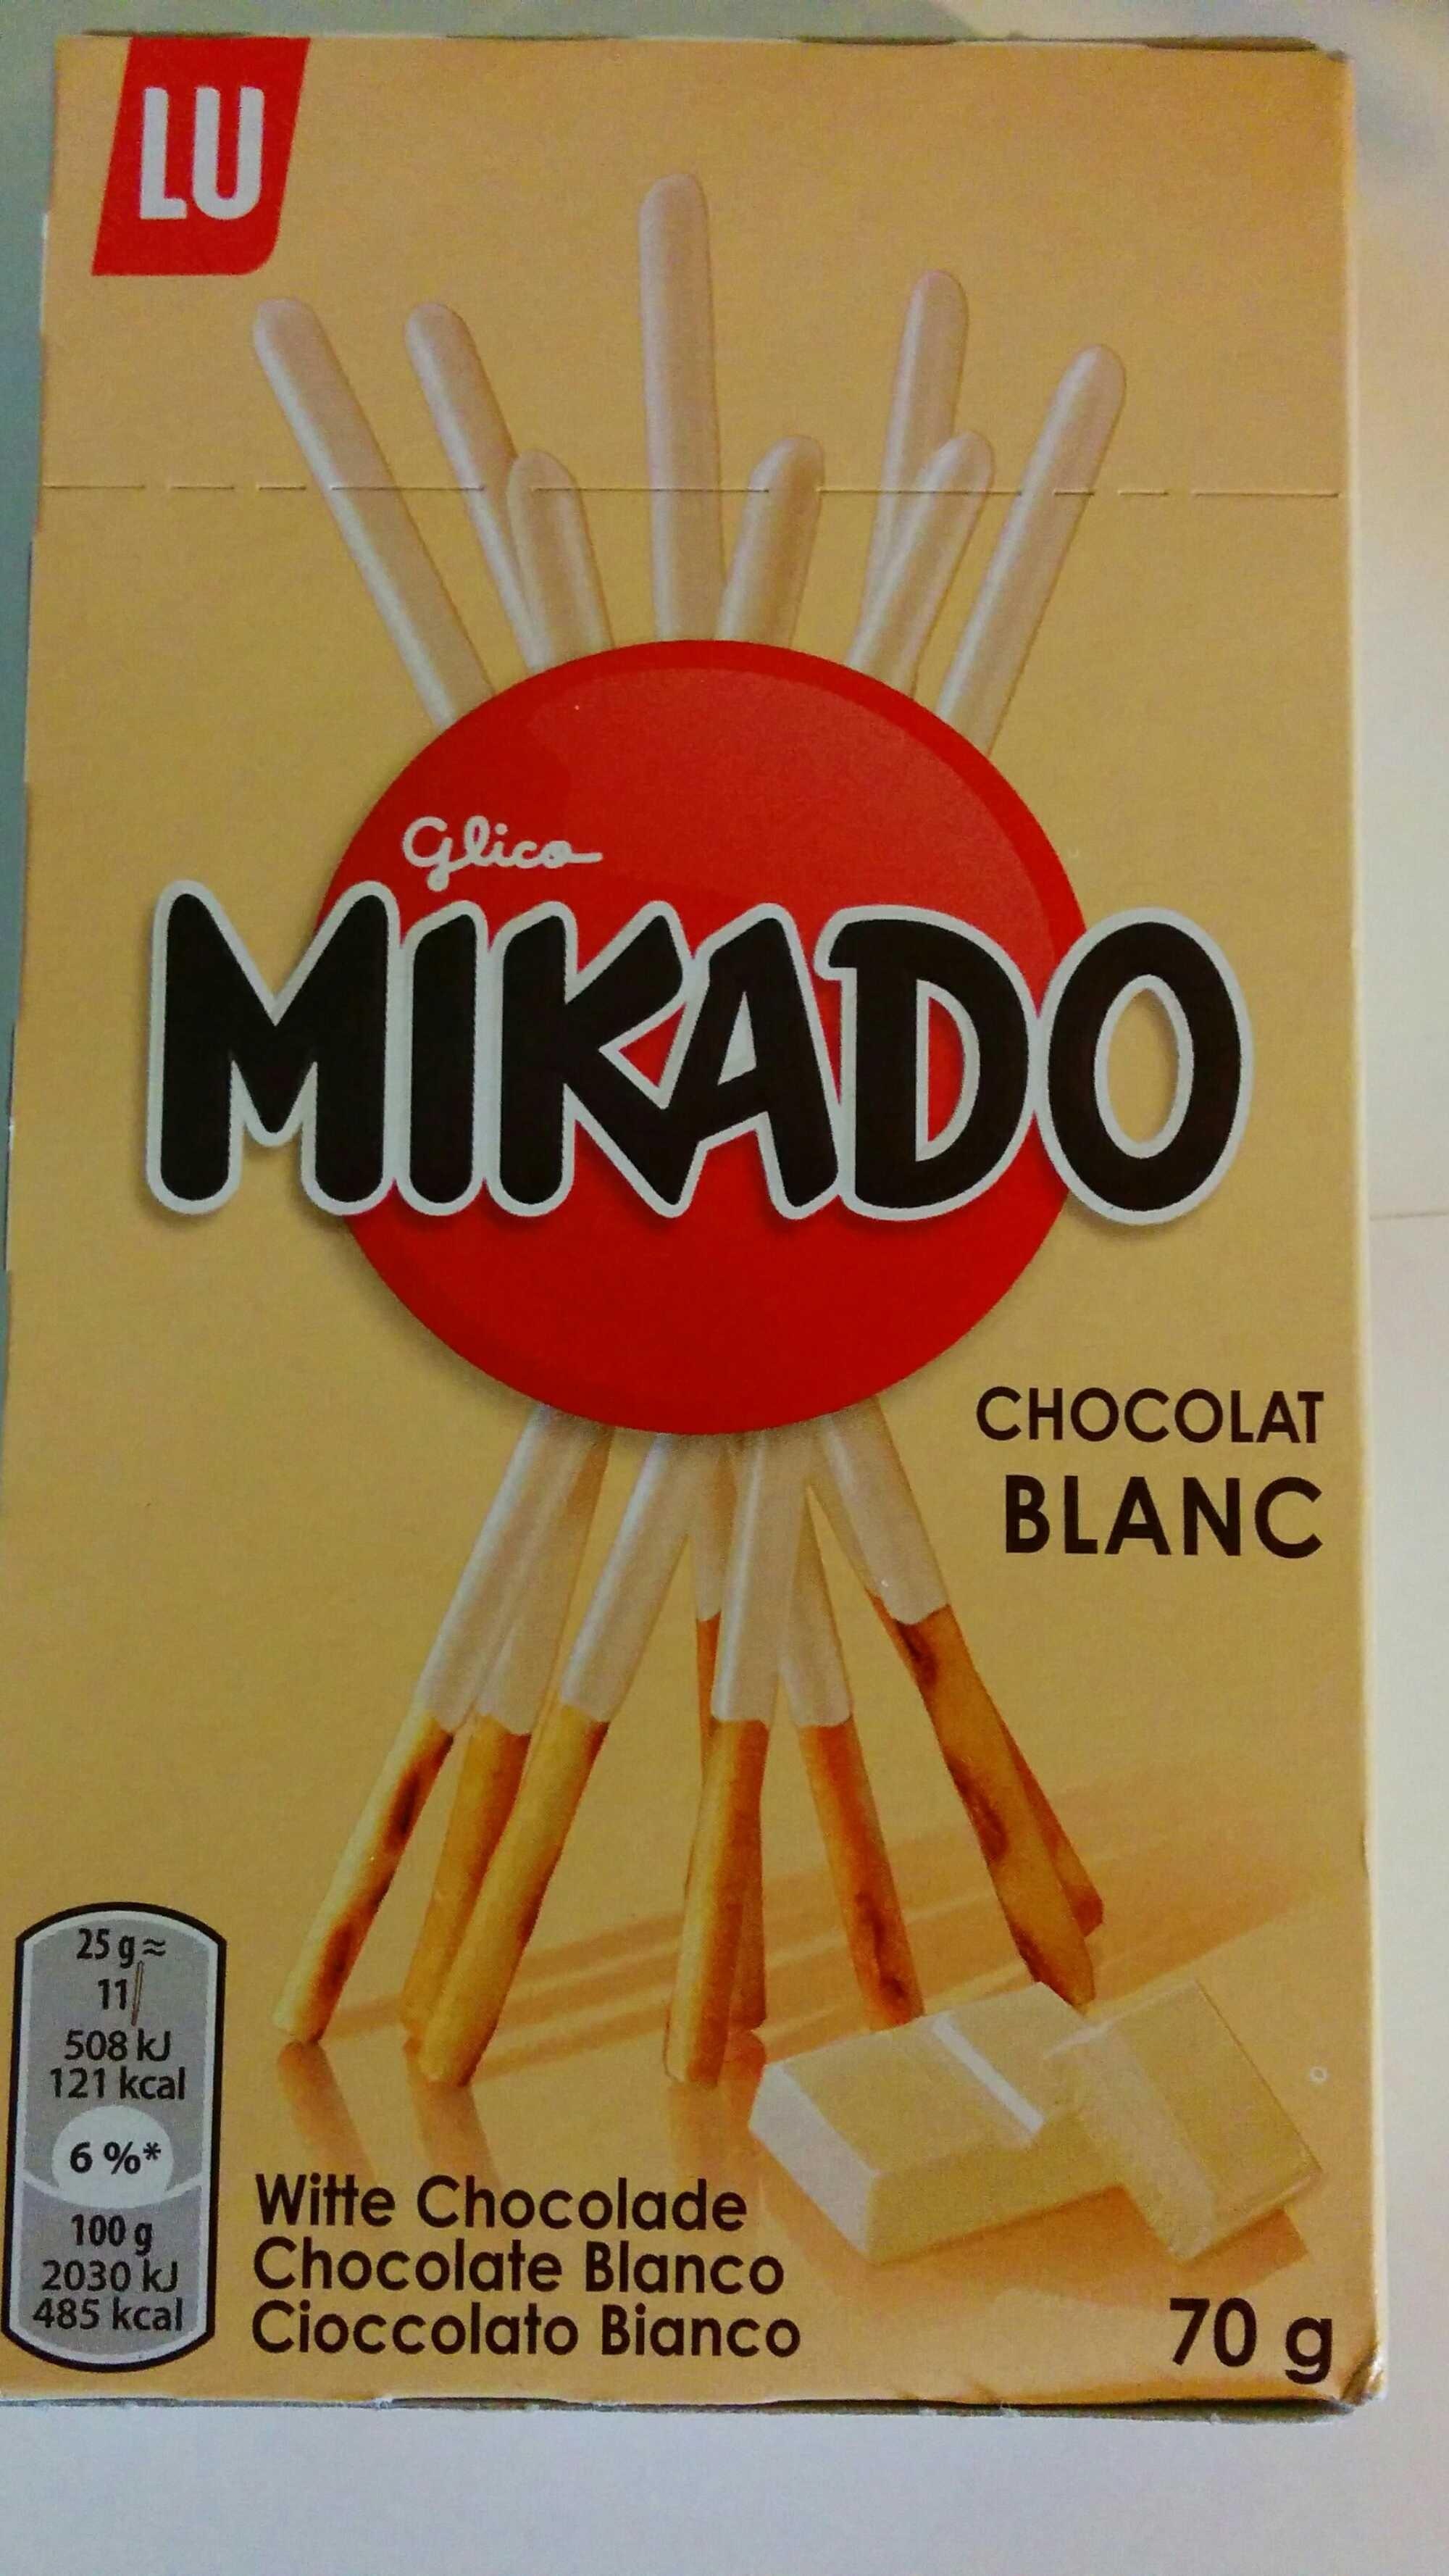 Mikado chocolat blanc - Produit - fr